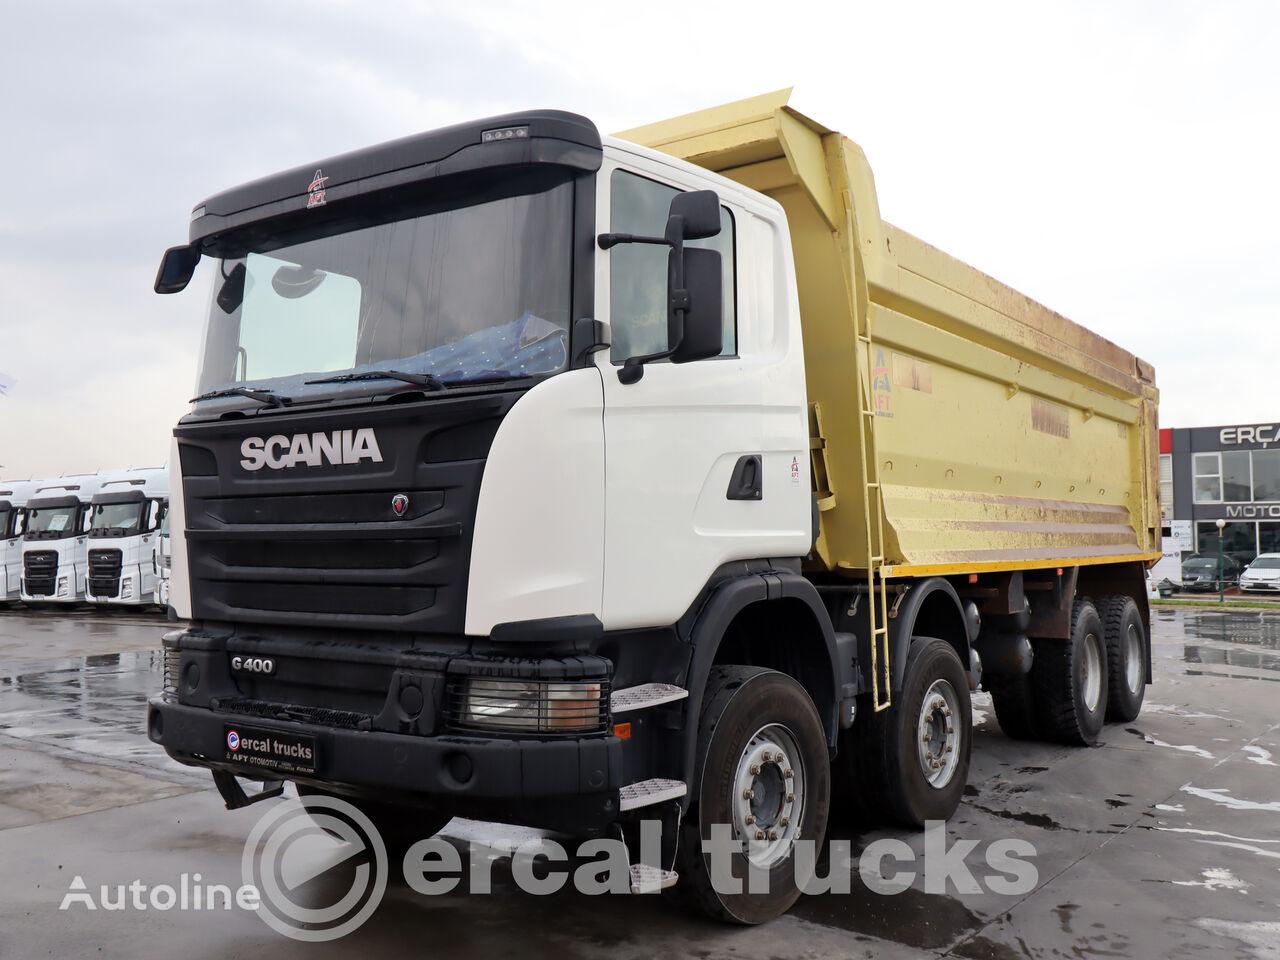 SCANIA 2015 G 400 AC EURO 5 8X4 HARDOX TIPPER dump truck